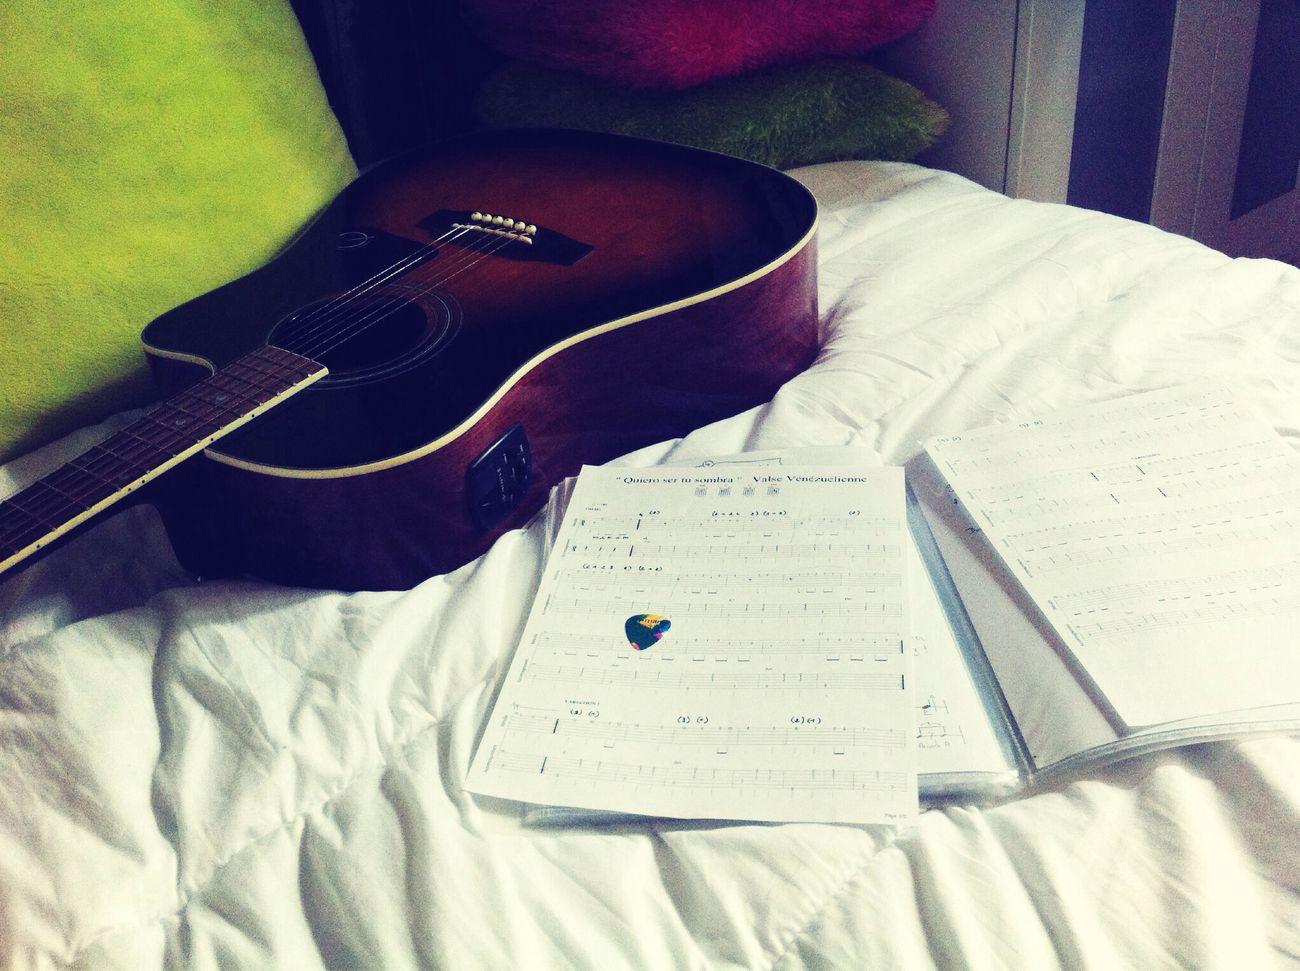 Playtime Guitar Work Lasy ???